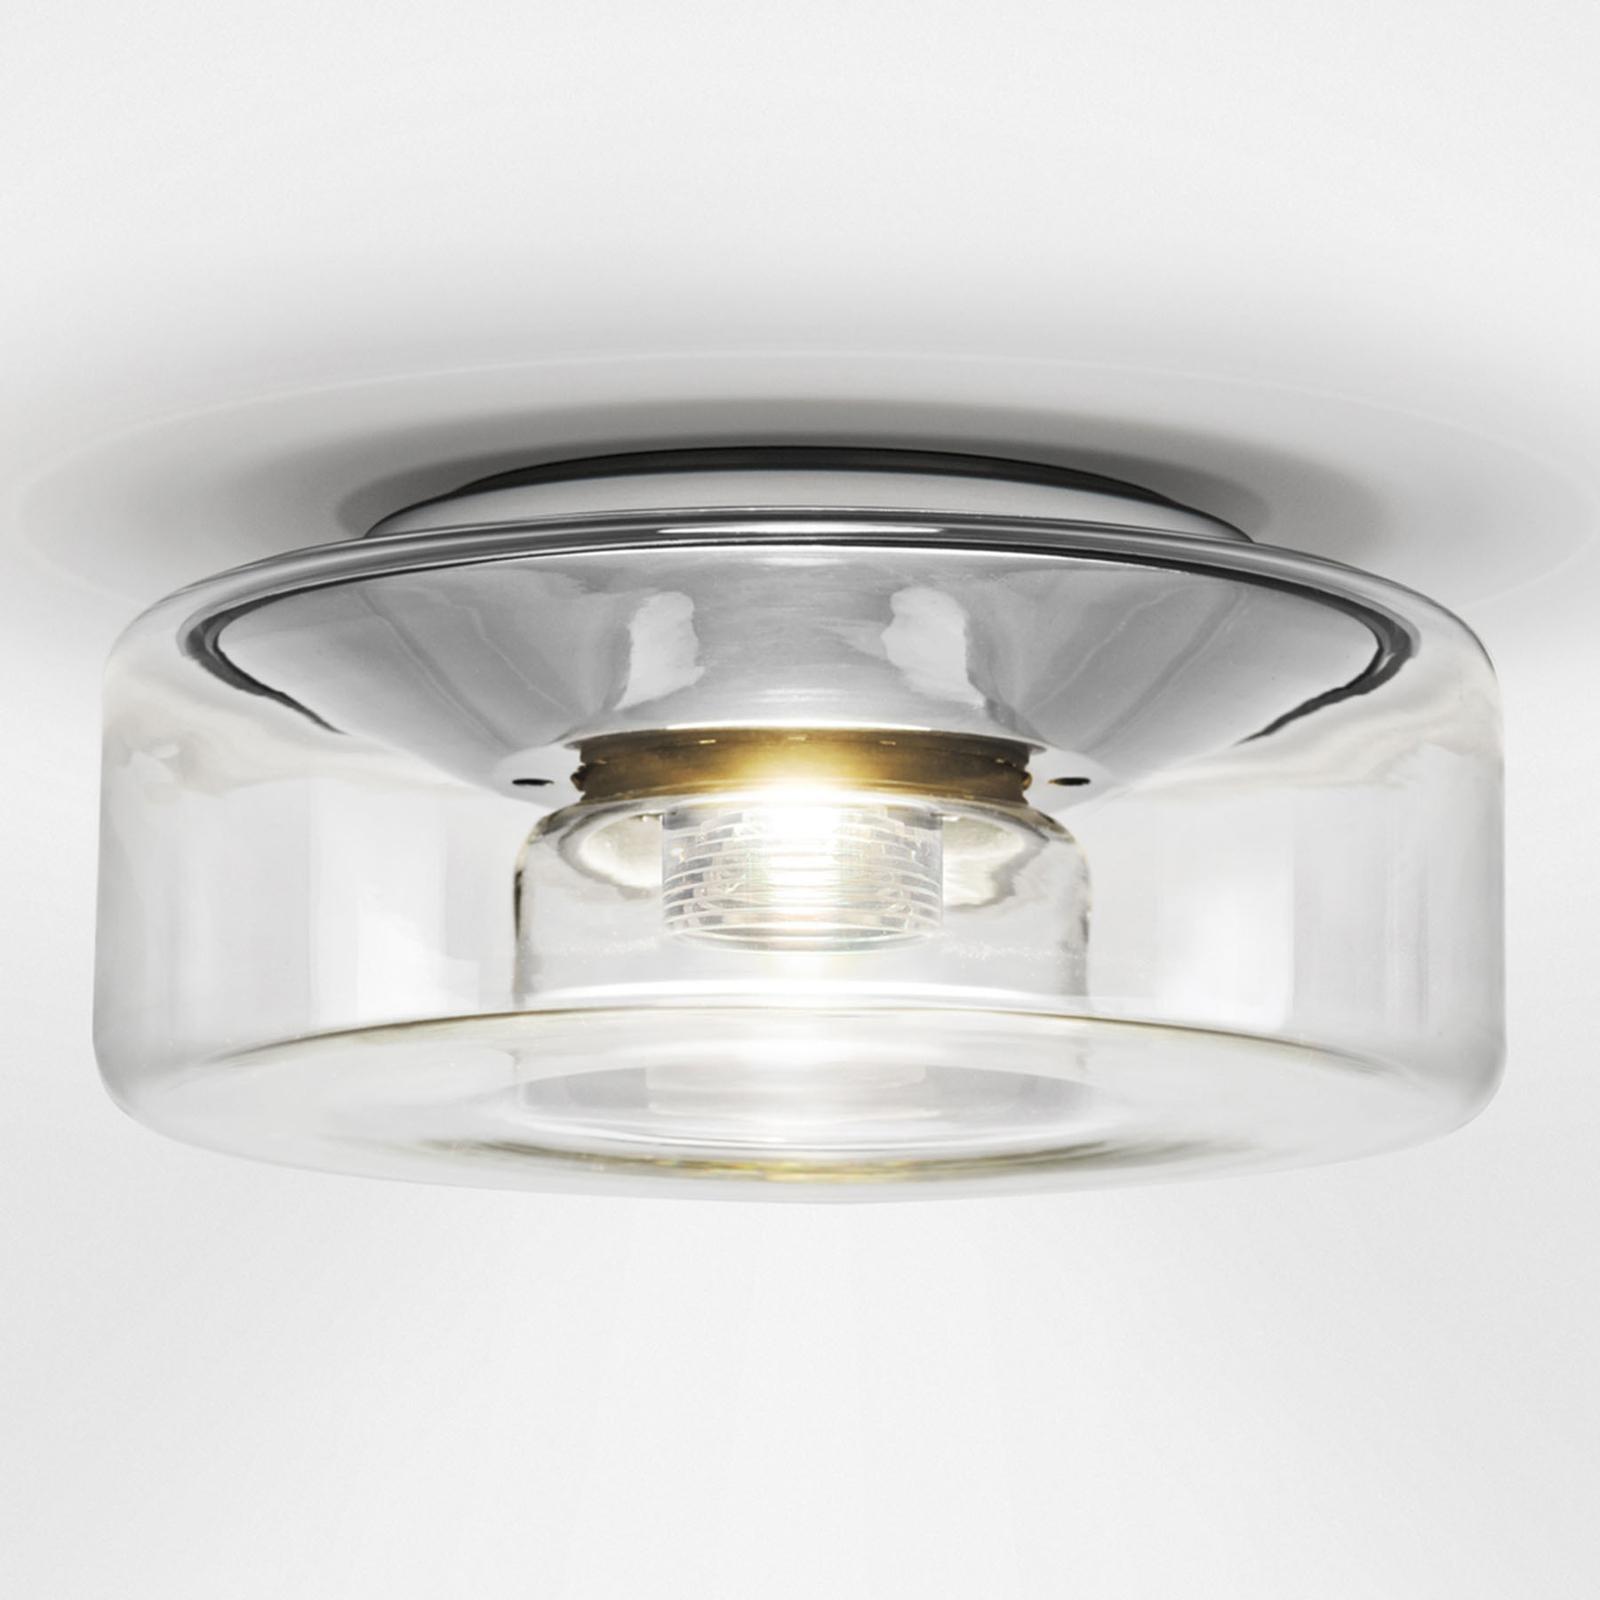 serien.lighting Curling S Decke 2.700K Acryl klar